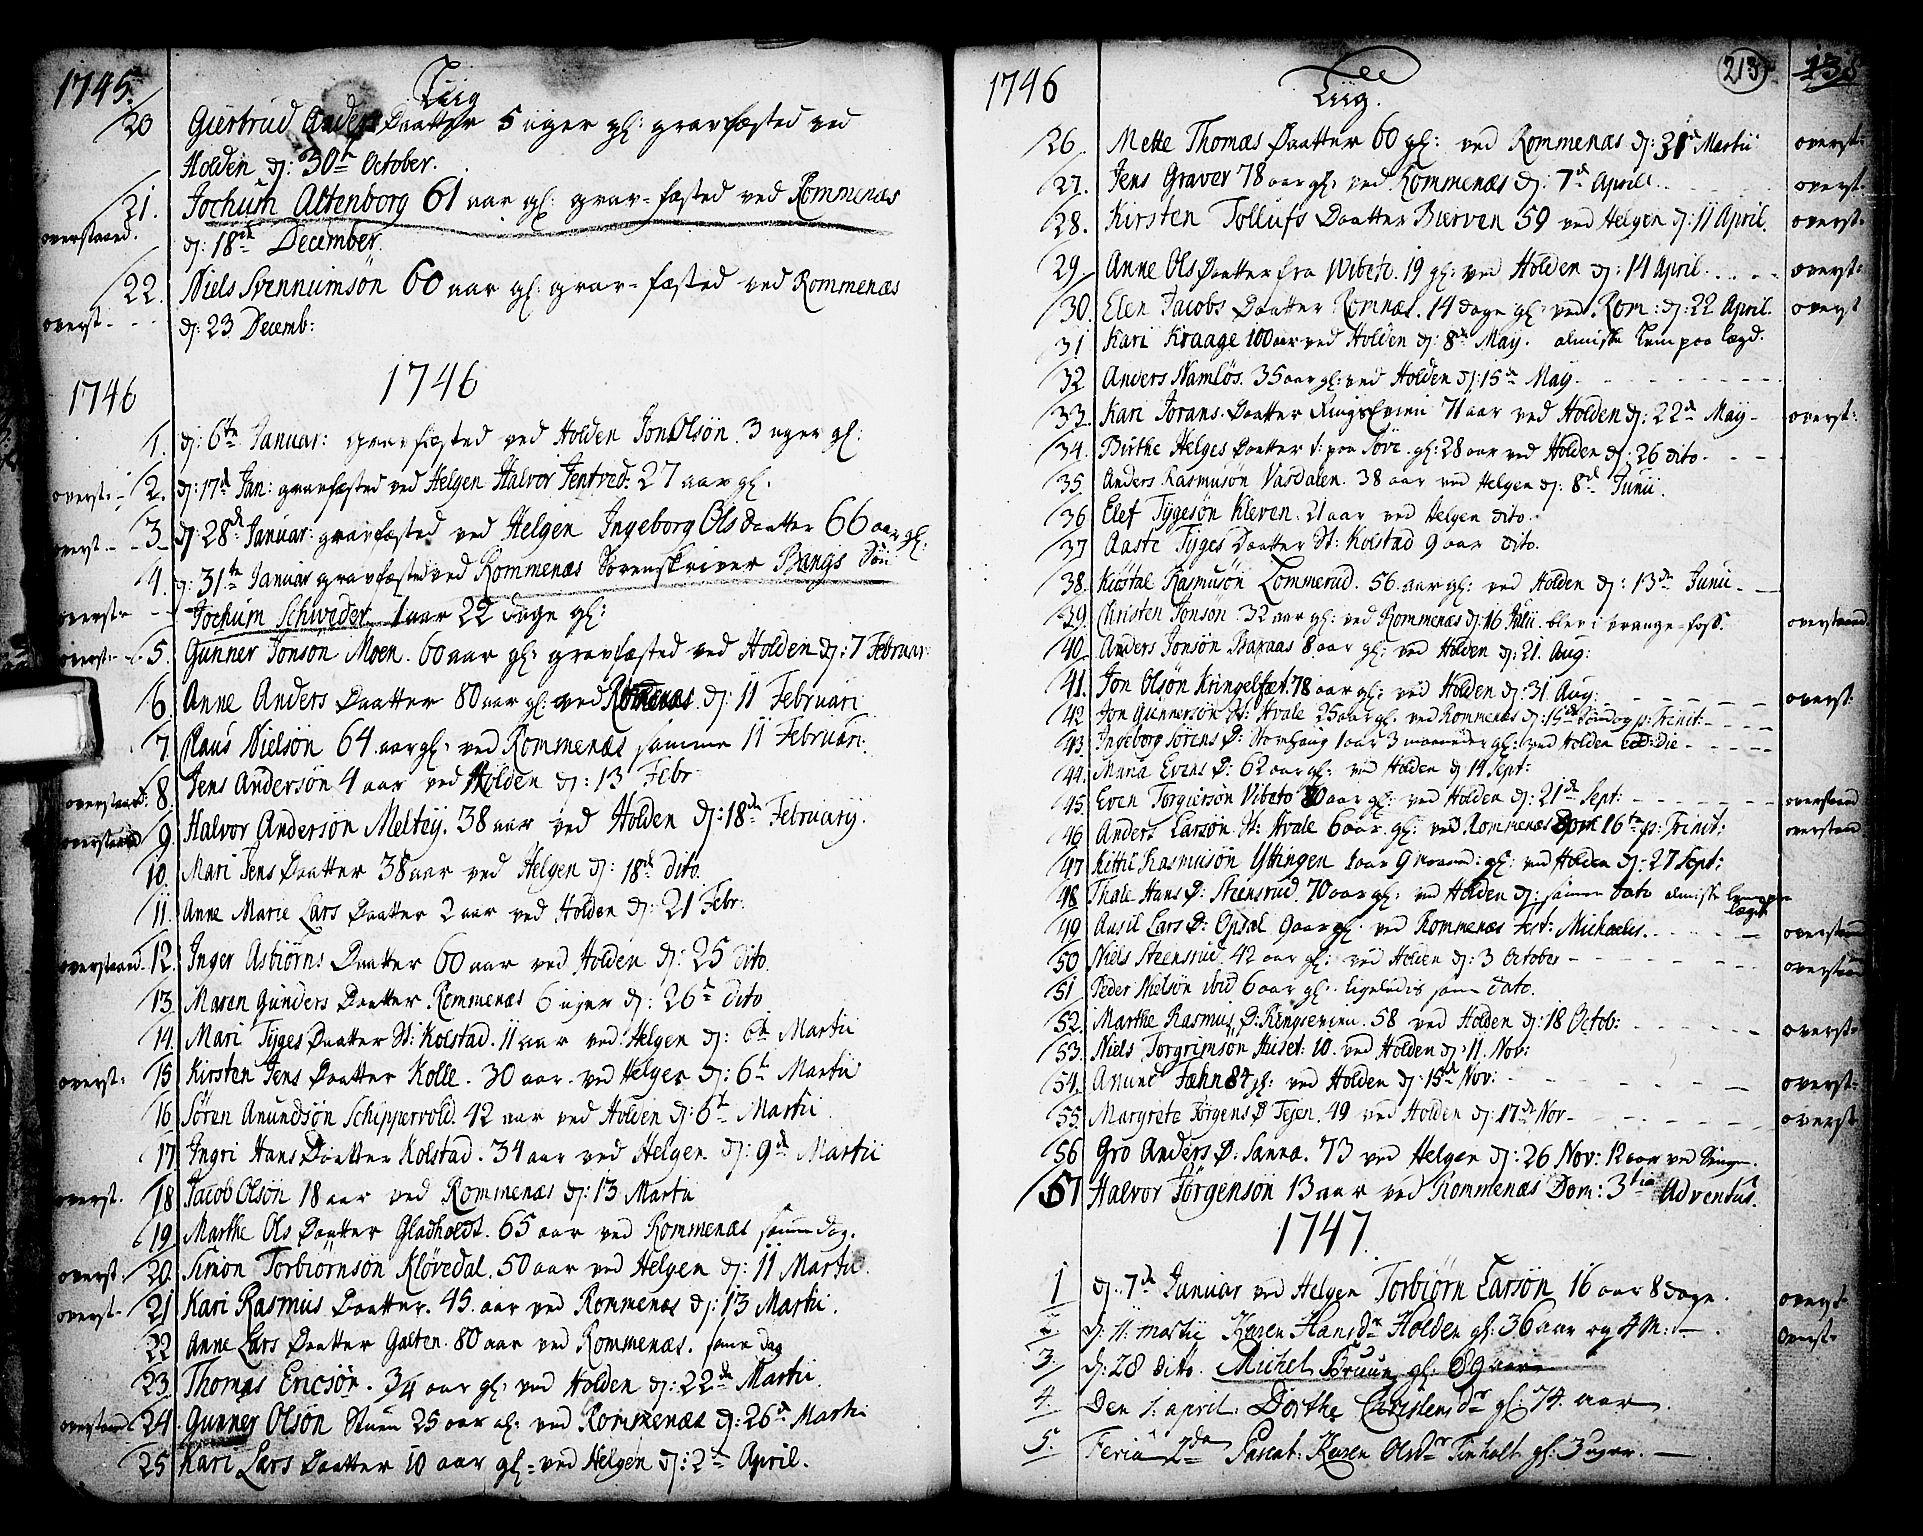 SAKO, Holla kirkebøker, F/Fa/L0001: Ministerialbok nr. 1, 1717-1779, s. 213